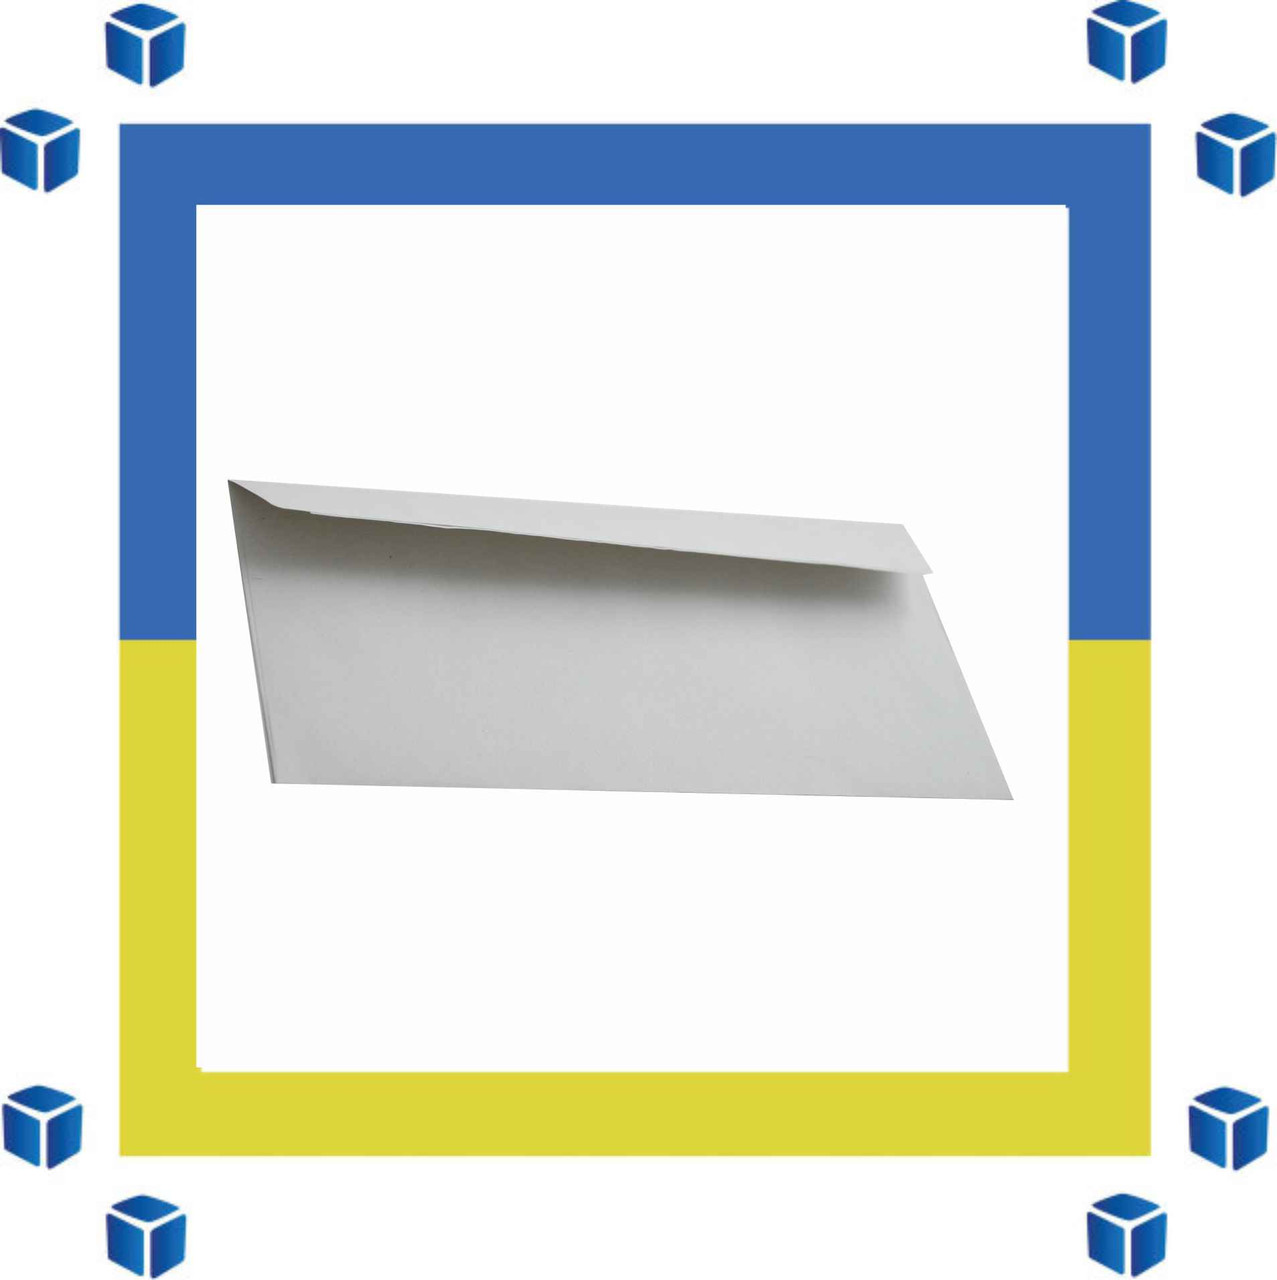 Конверты Е65 (DL) (110х220) скл, серый (0+0)